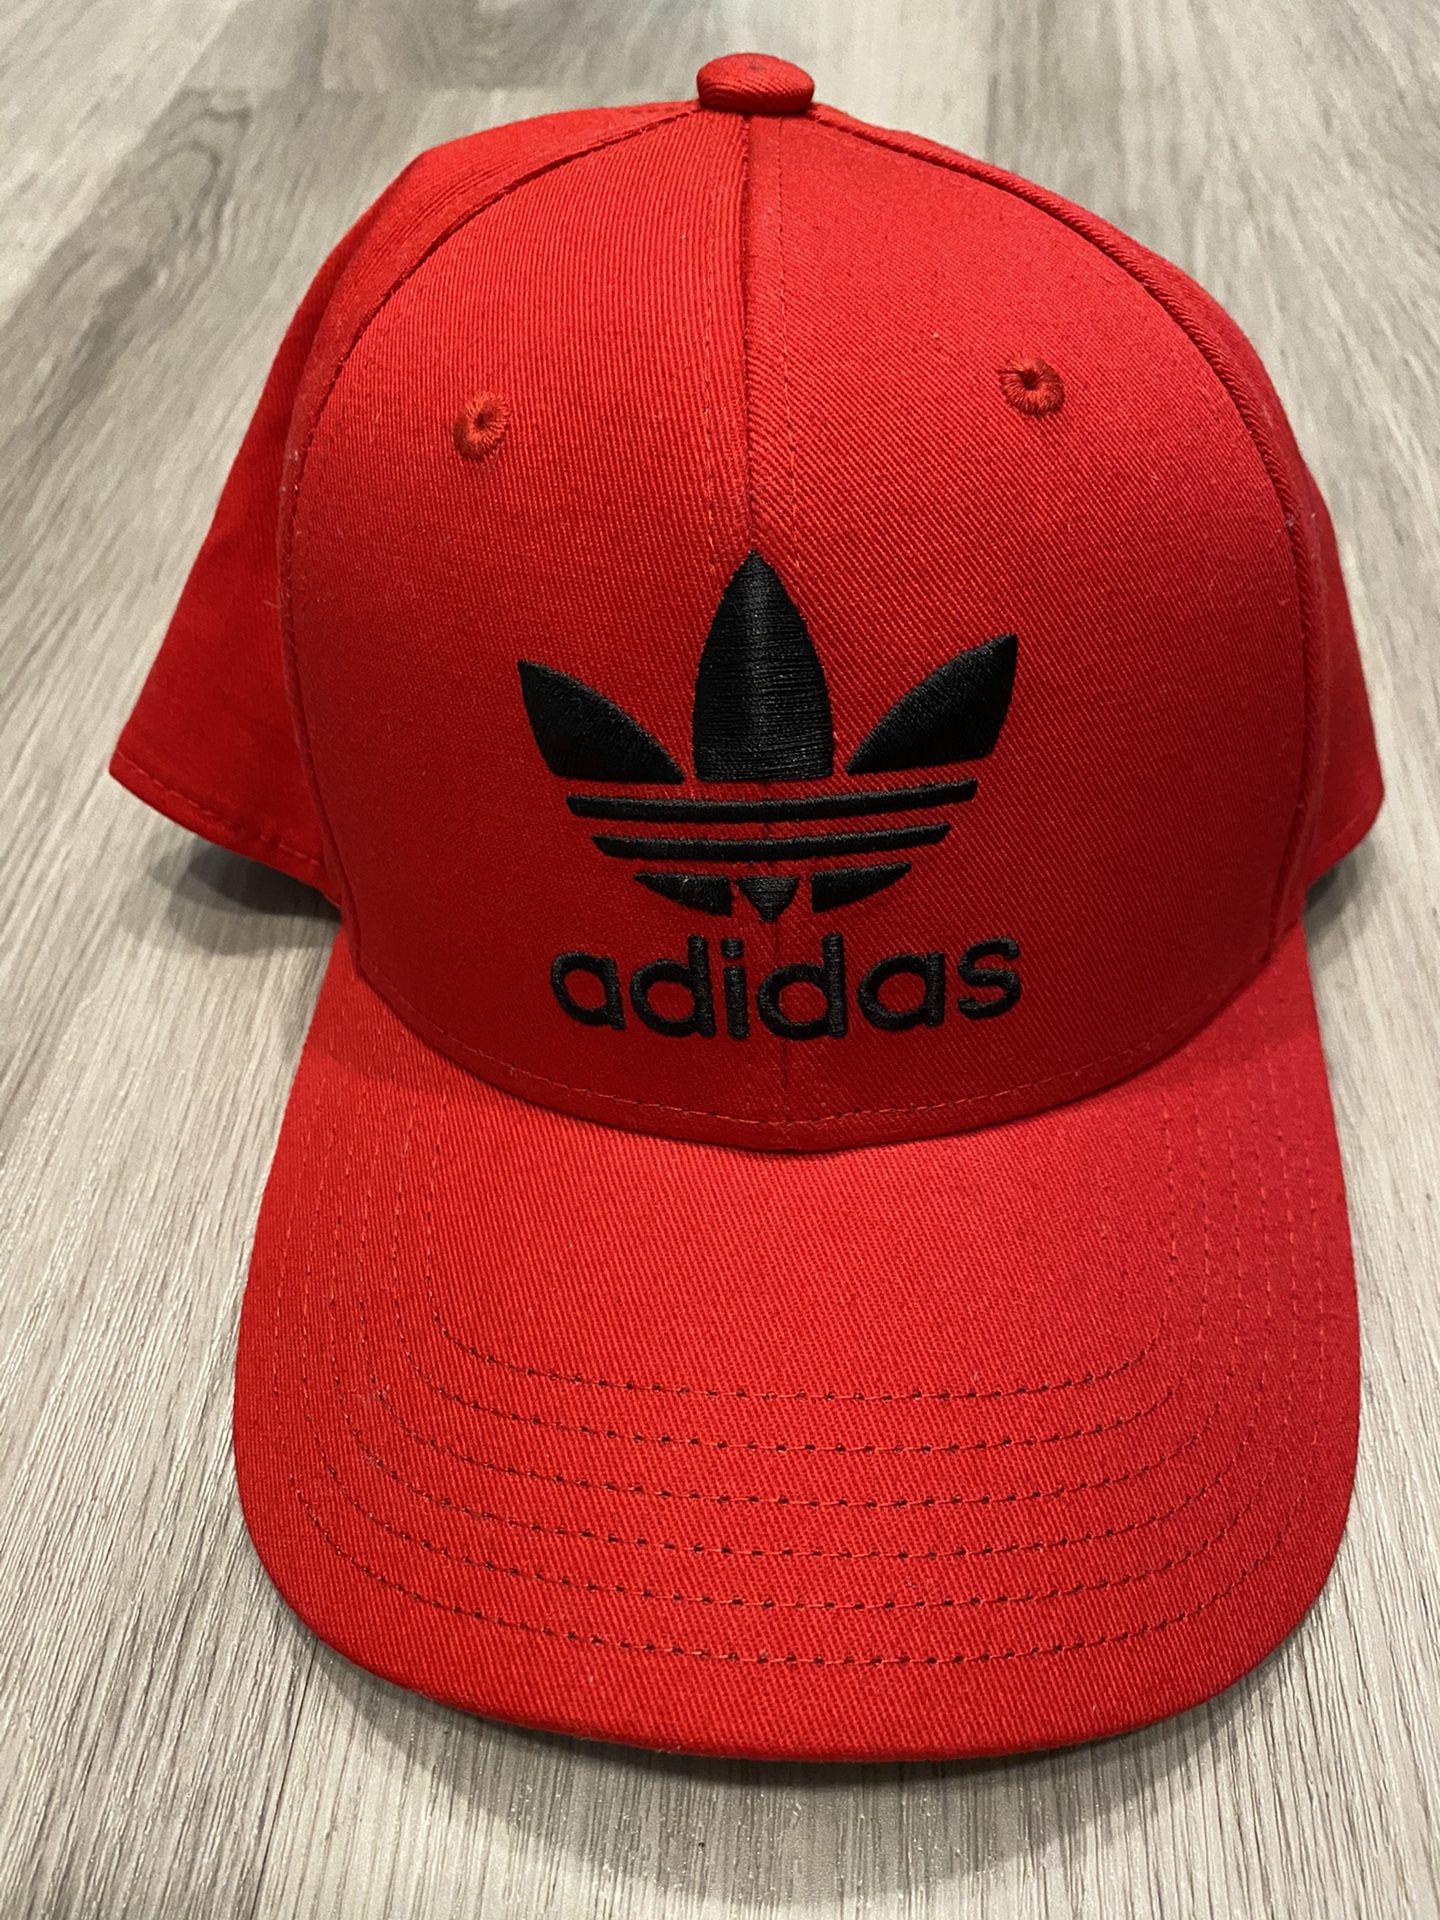 Hat snapback baseball cap